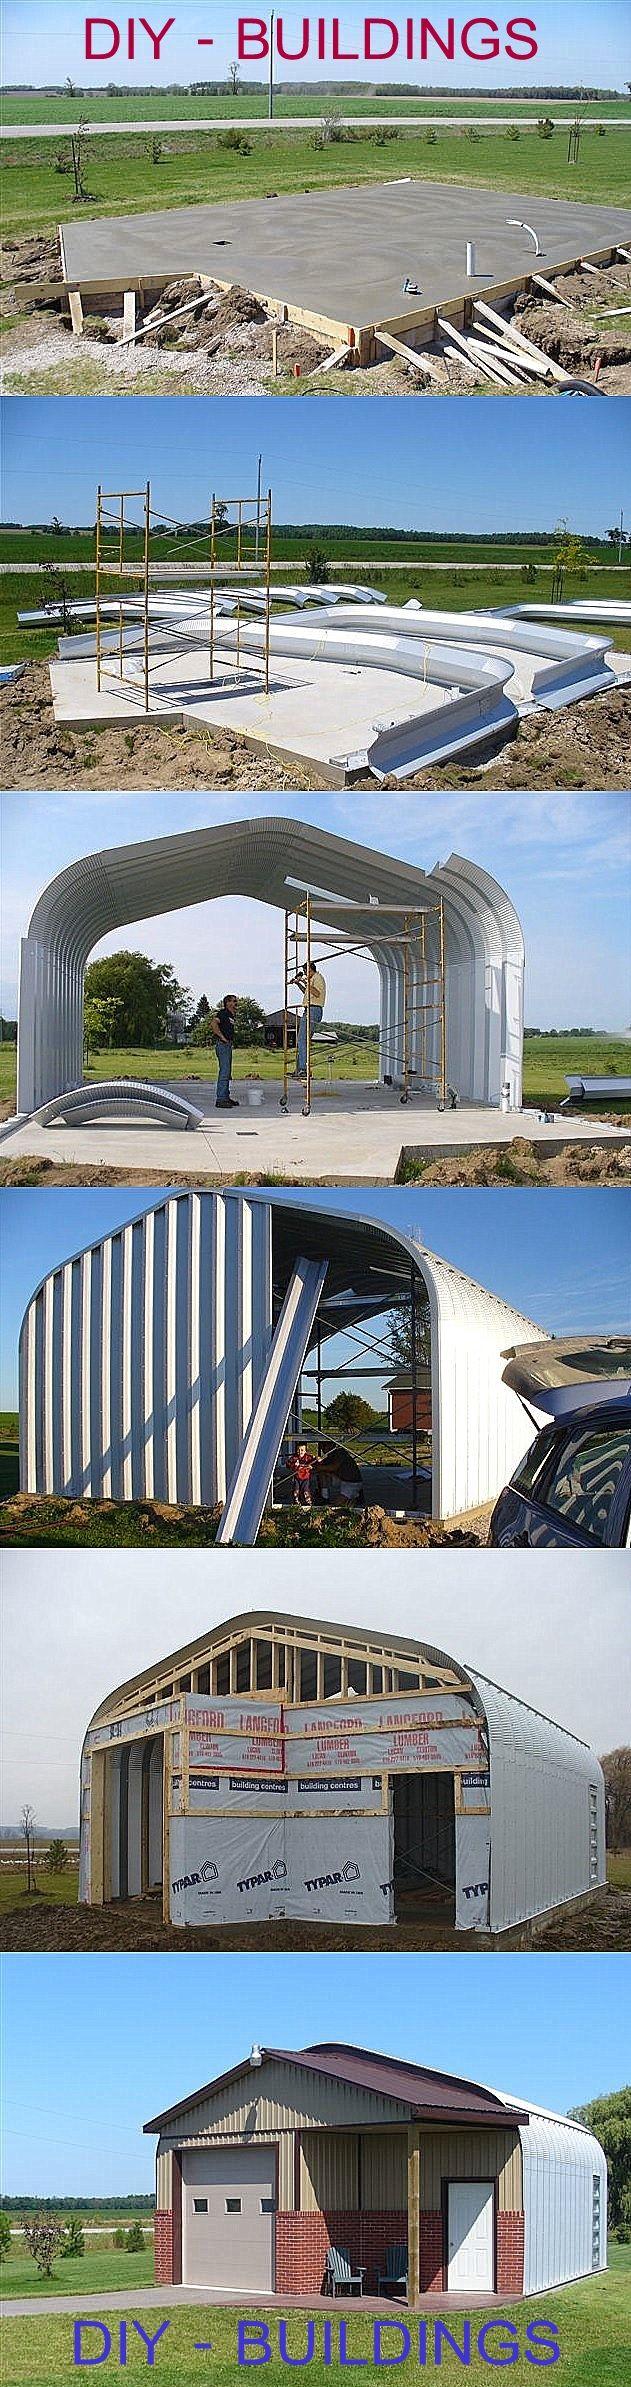 Great custom-made buildings including shop, garage, storage